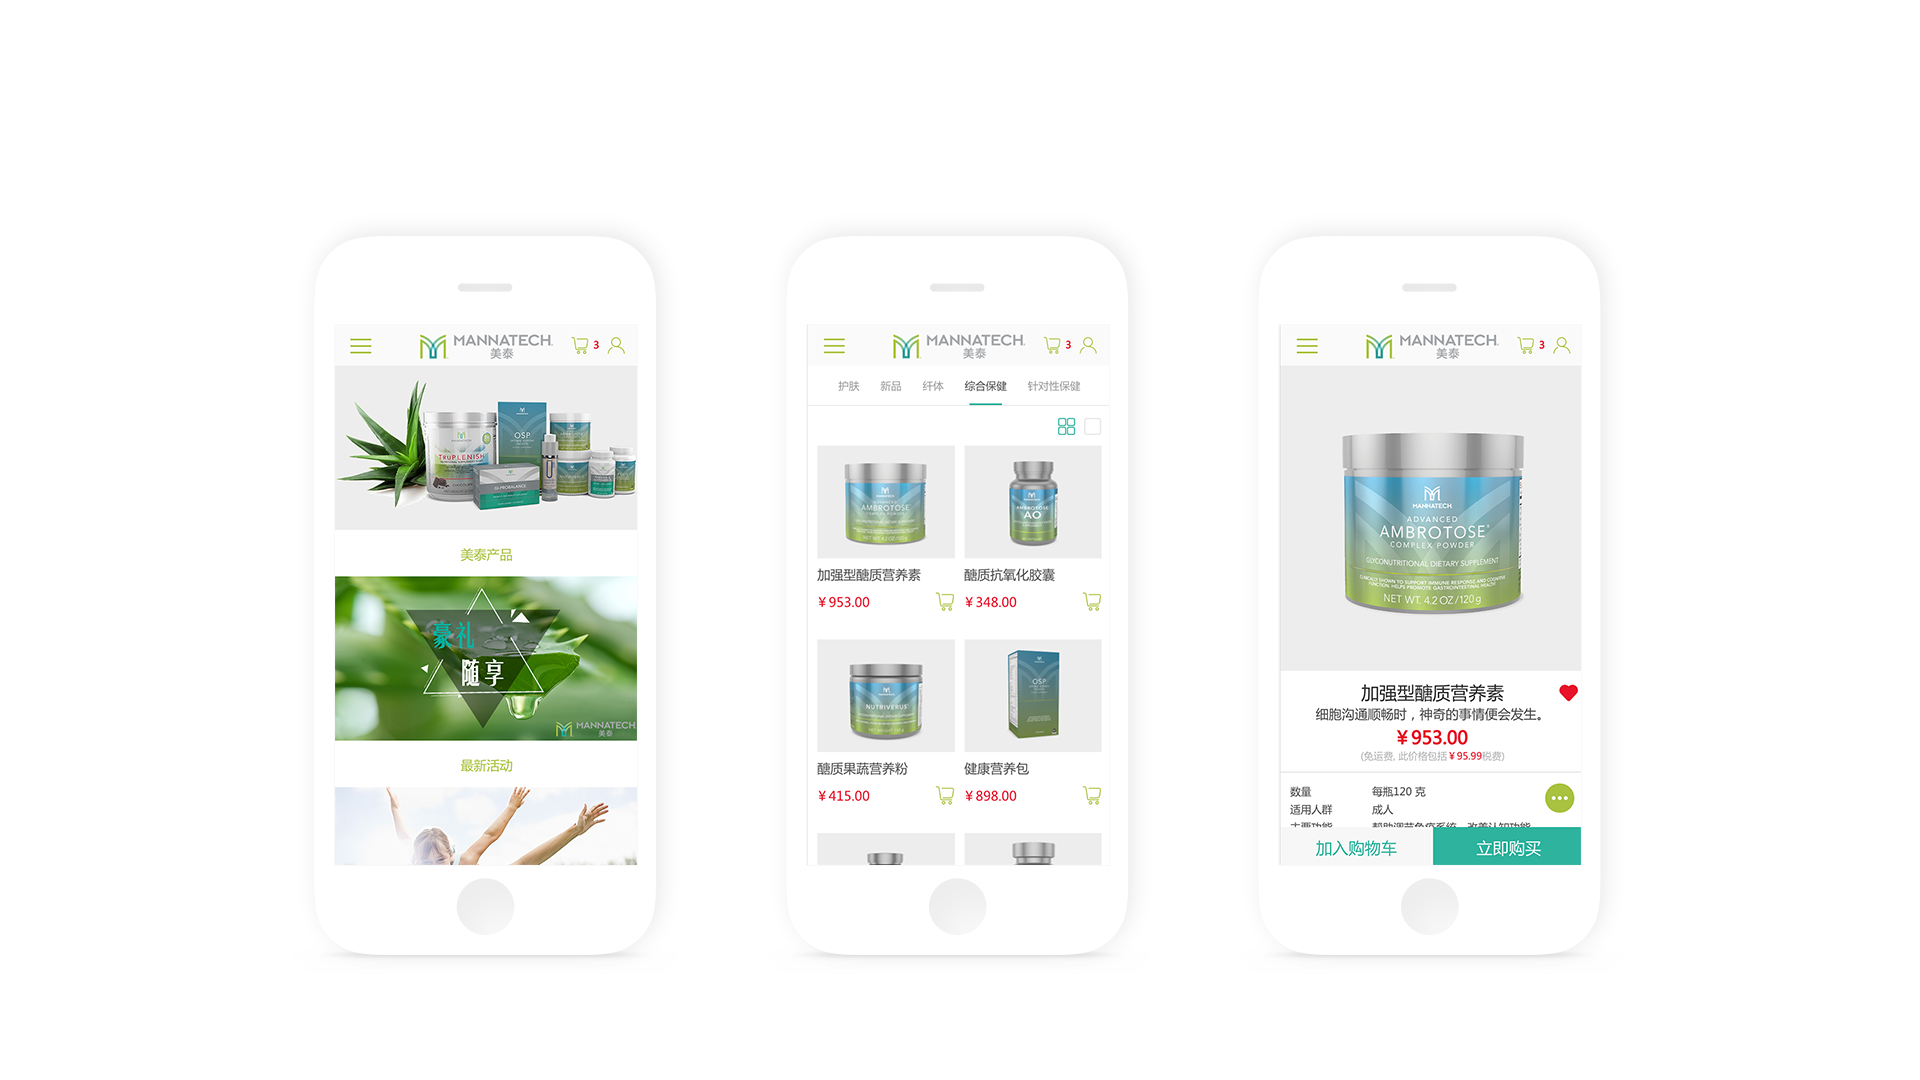 eCommerce website development-Mobile Responsive Design-MANNATECH